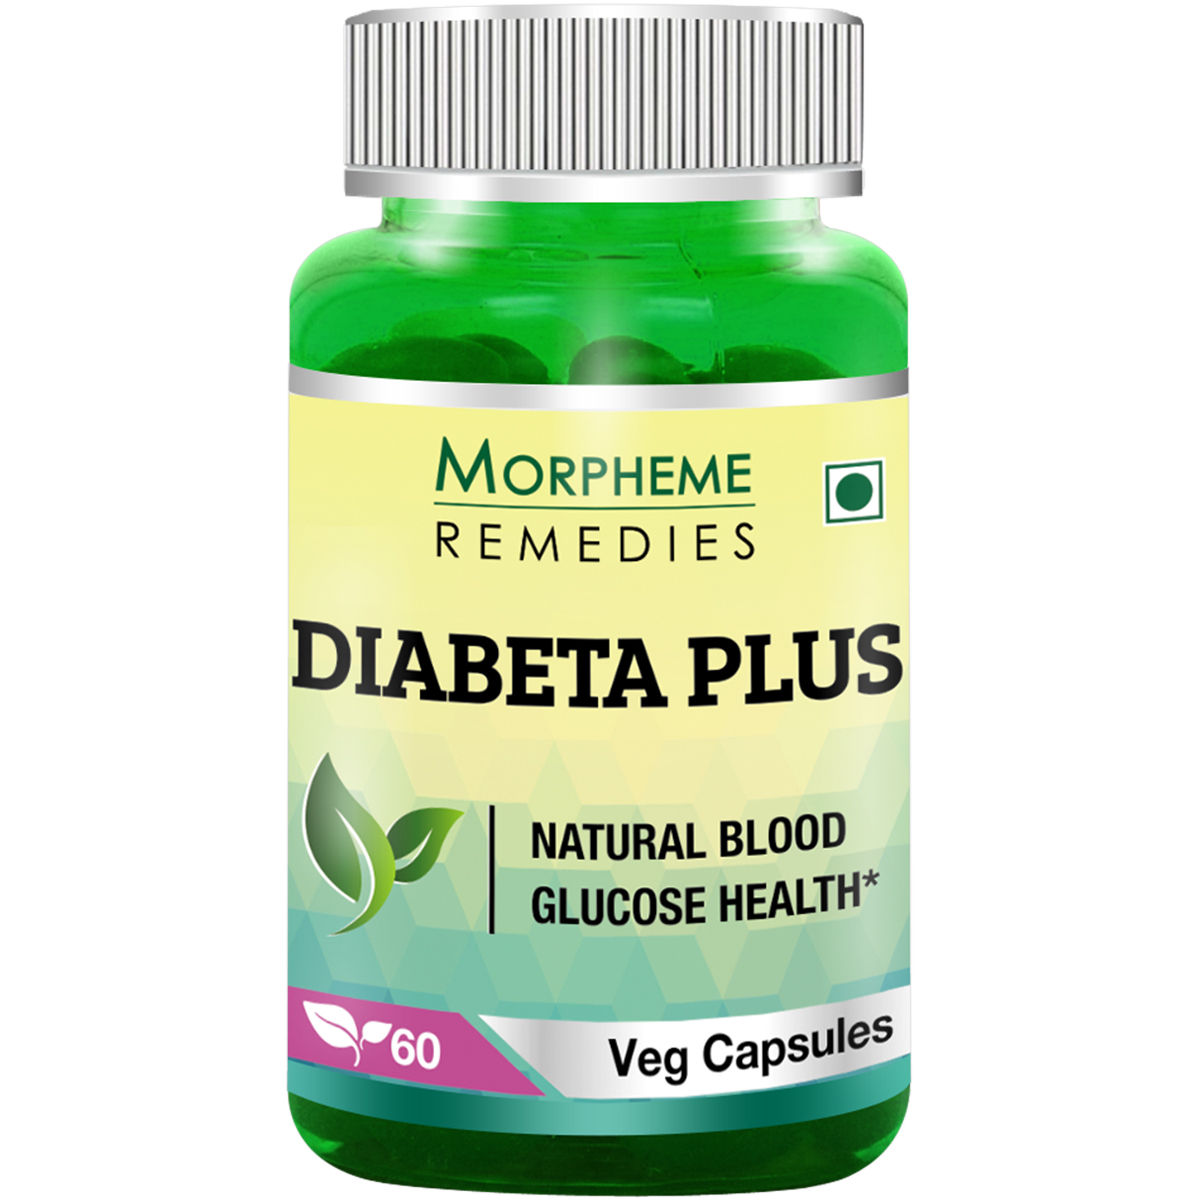 Morpheme Remedies Diabeta Plus Natural Blood Glucose Health - 500mg Extract